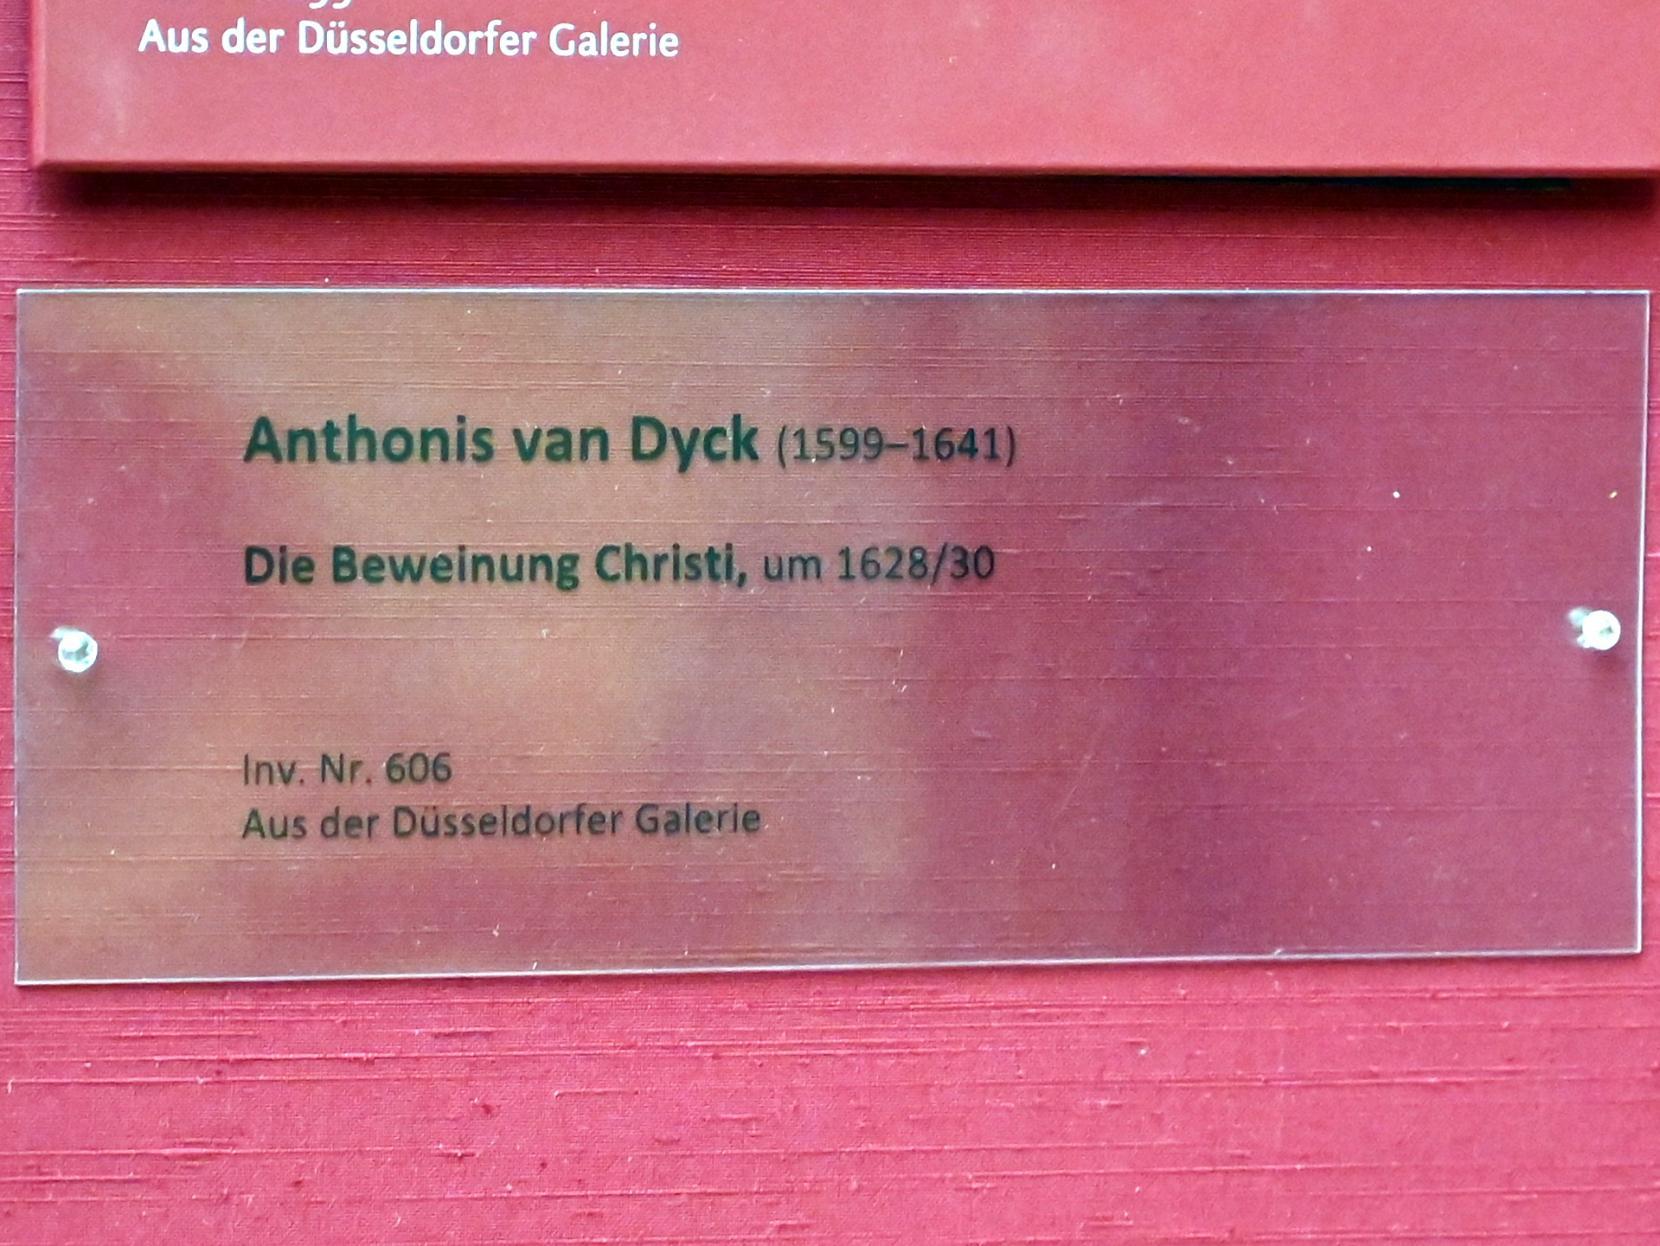 Anthonis (Anton) van Dyck: Beweinung Christi, 1634, Bild 2/2